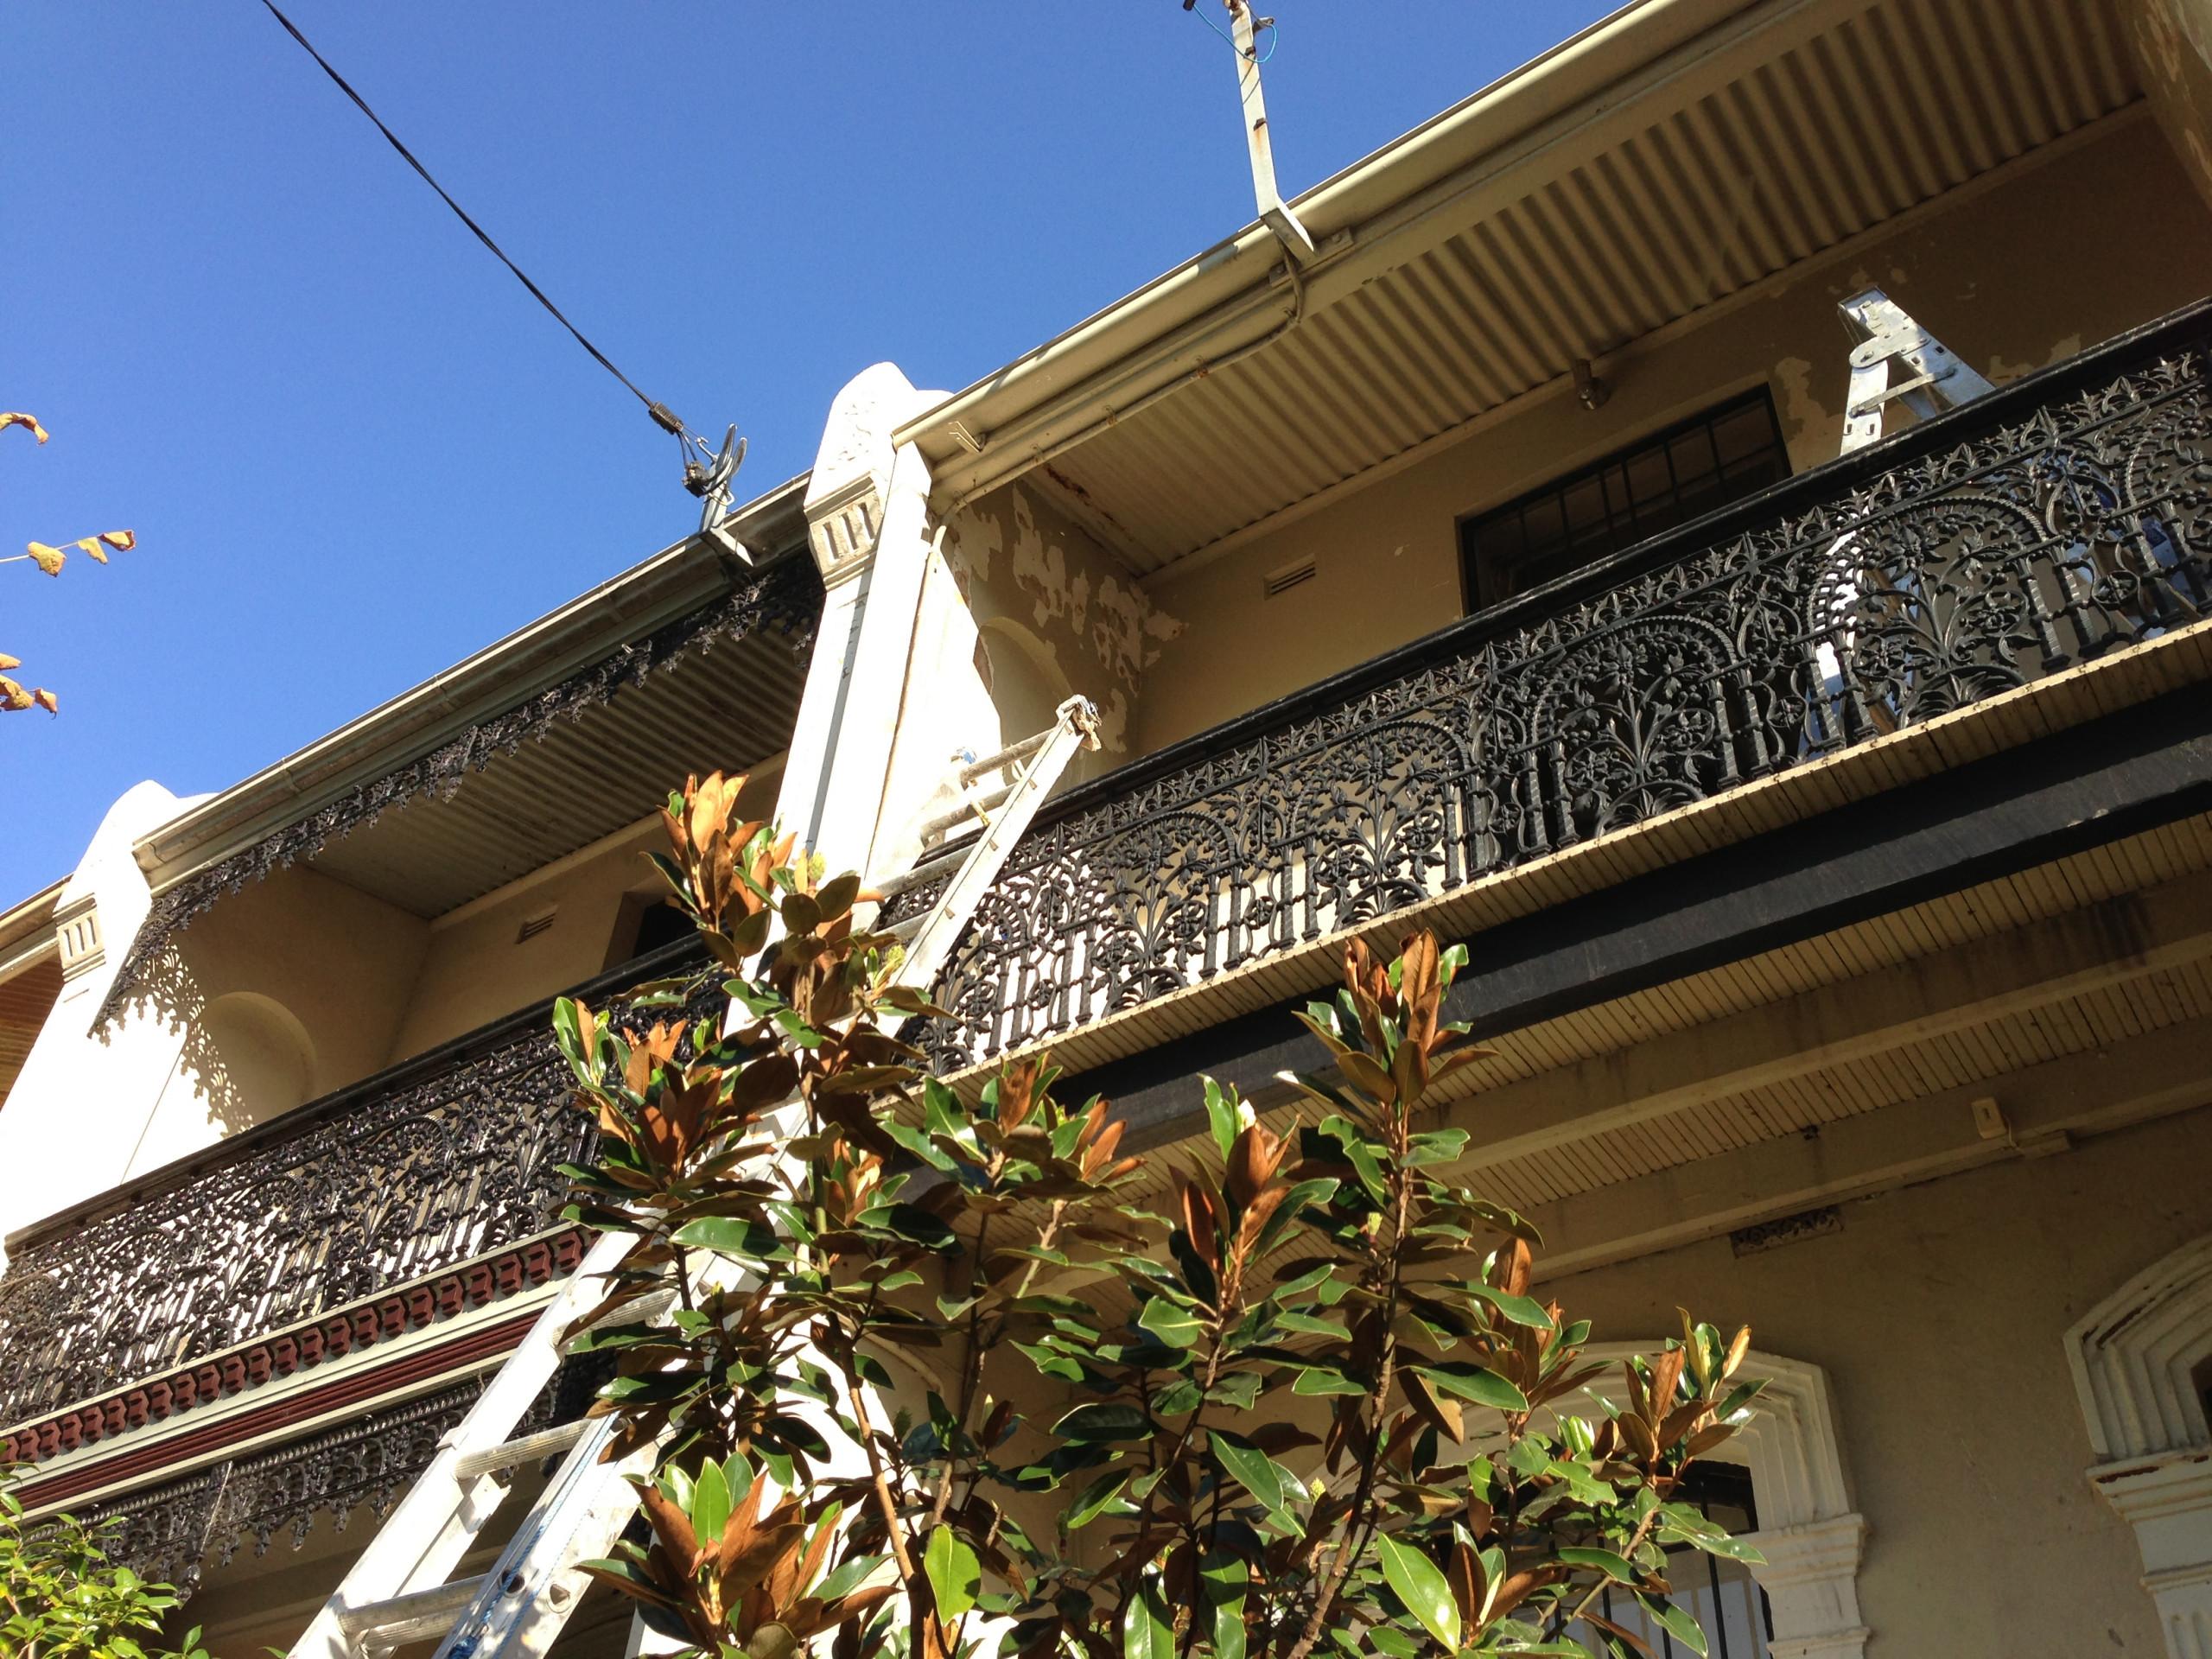 Interiors by award winning desiger - interior/exterior painting, Darlington